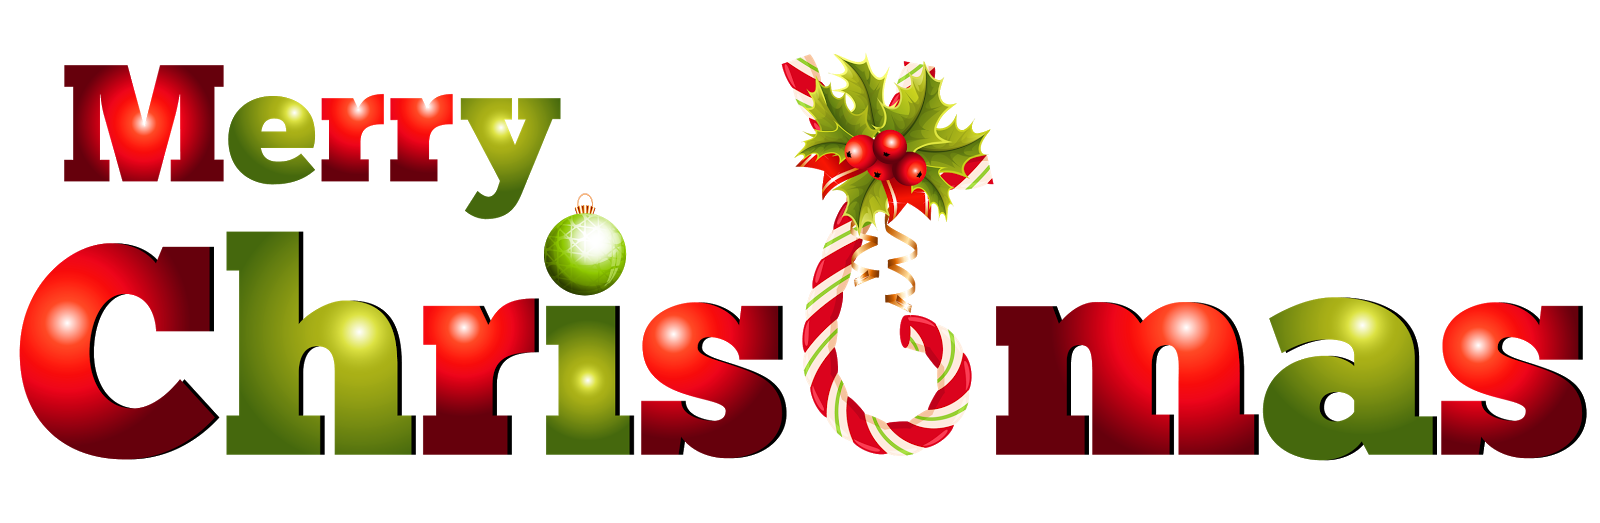 Merry christmas clip art ~ Media Wallpapers